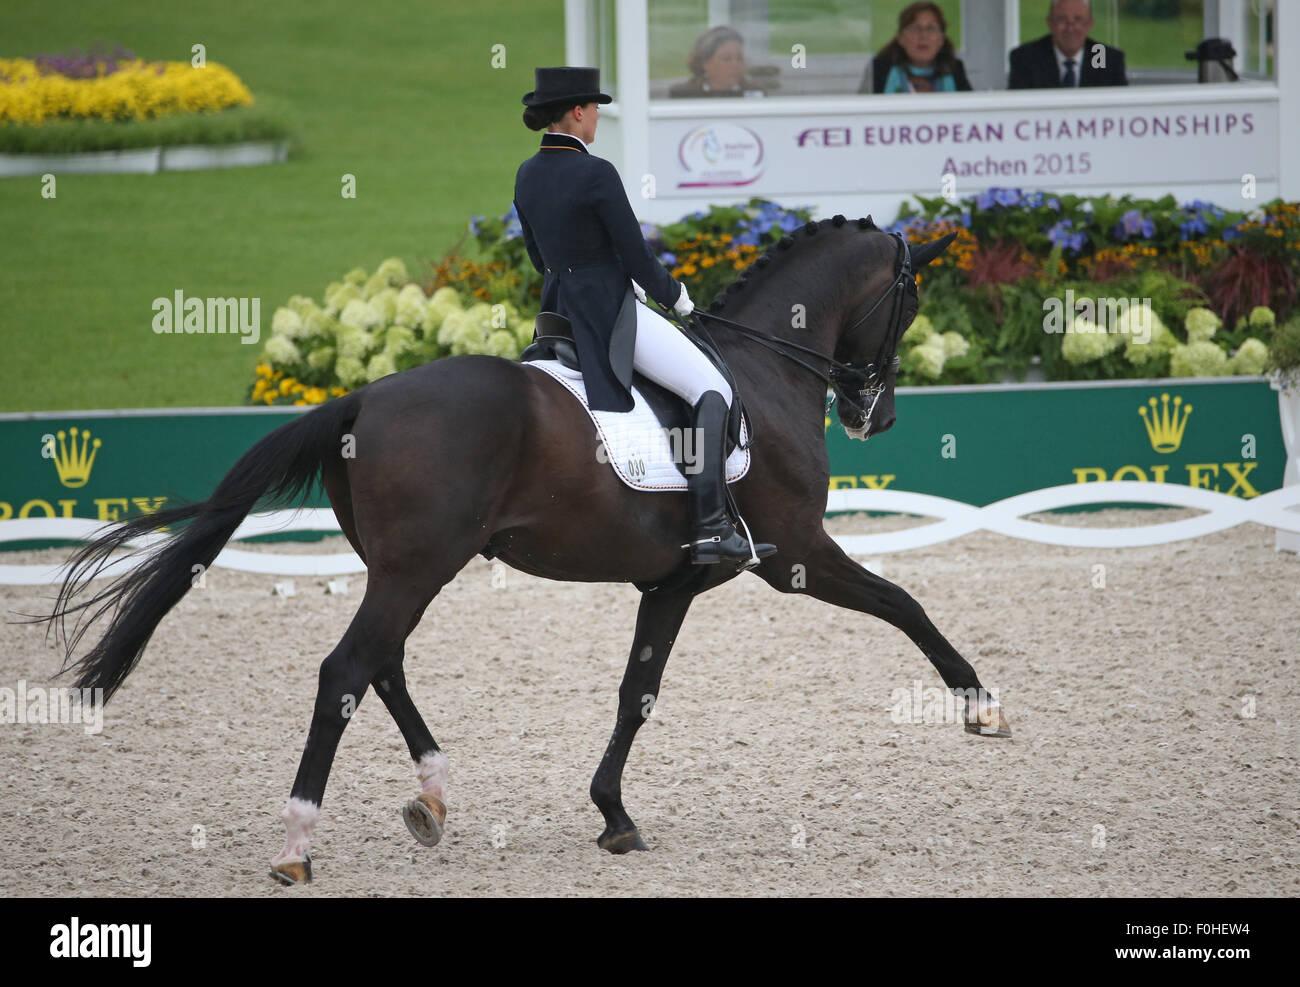 Kristina Broering Sprehe Of Germany Rides Her Horse Desperados In The Stock Photo 86436704 Alamy